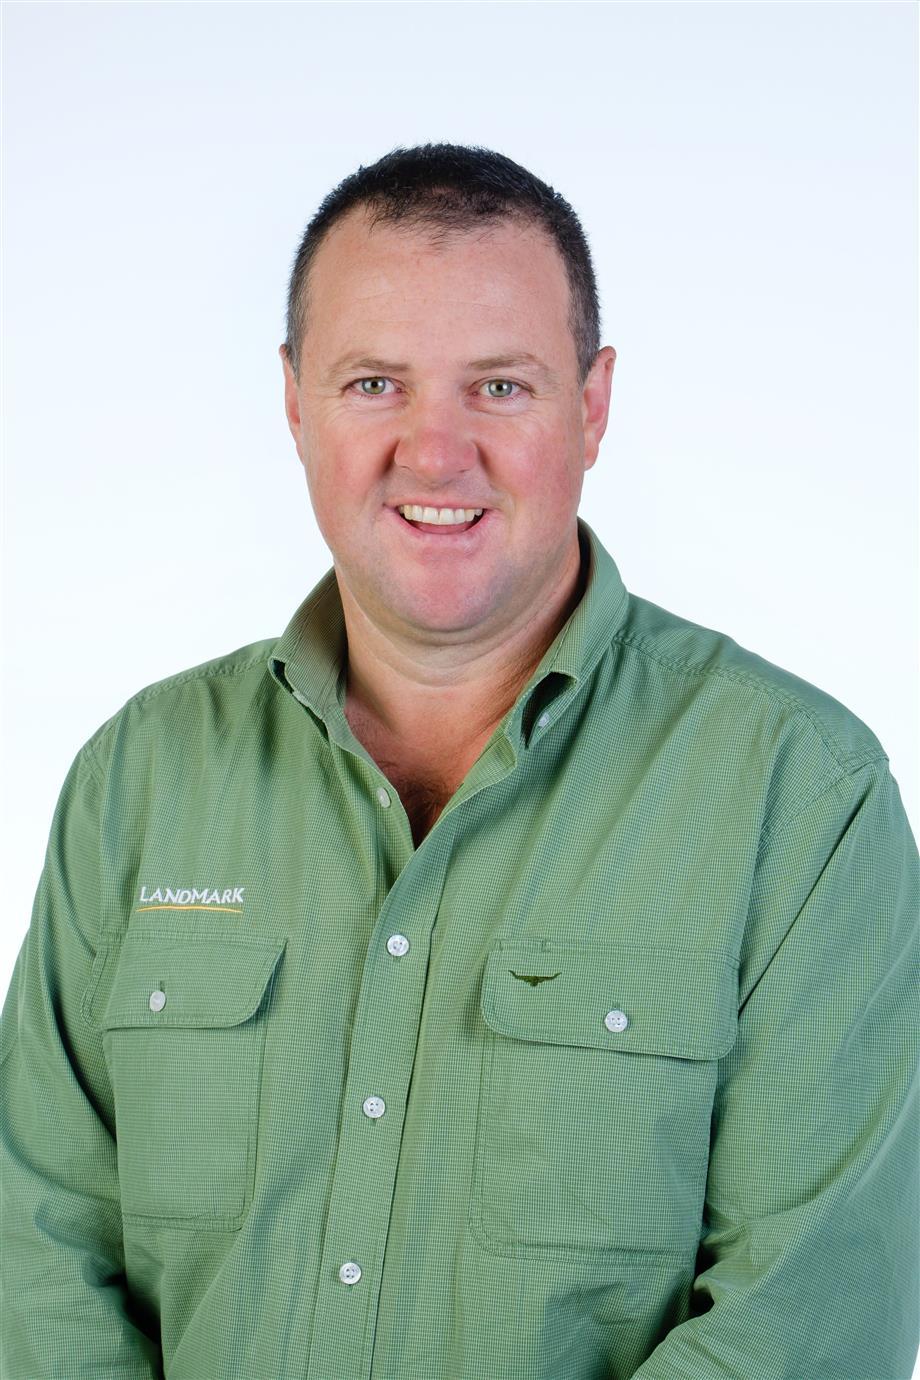 Experienced Livestock Manager Matt Pitzen